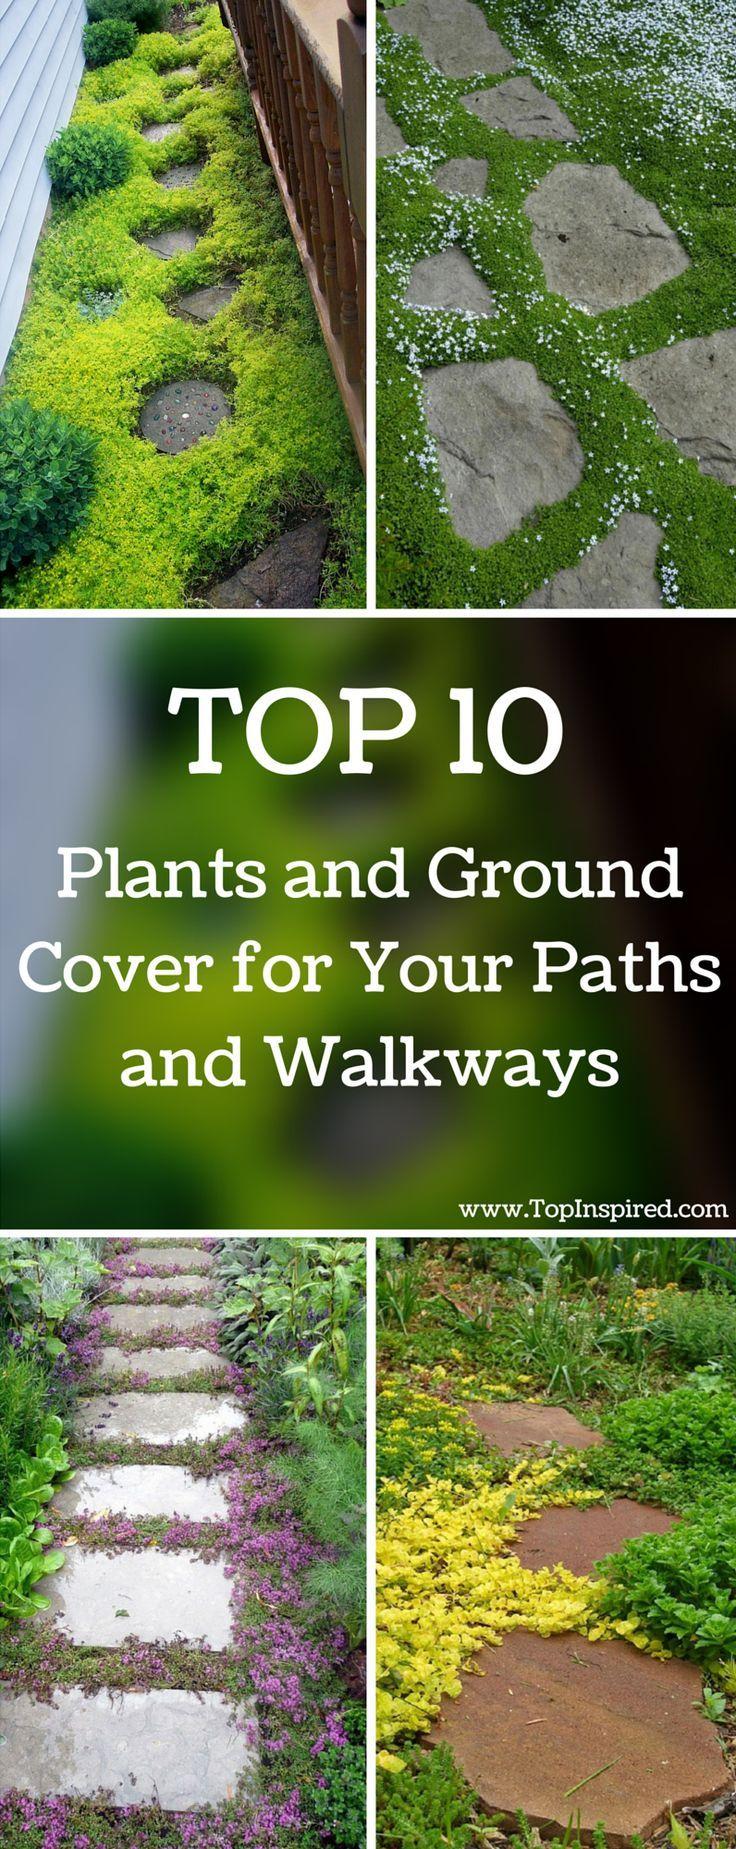 Beautiful and green #walkways are an integral part of every garden. #backyardliving #gardeninspiration